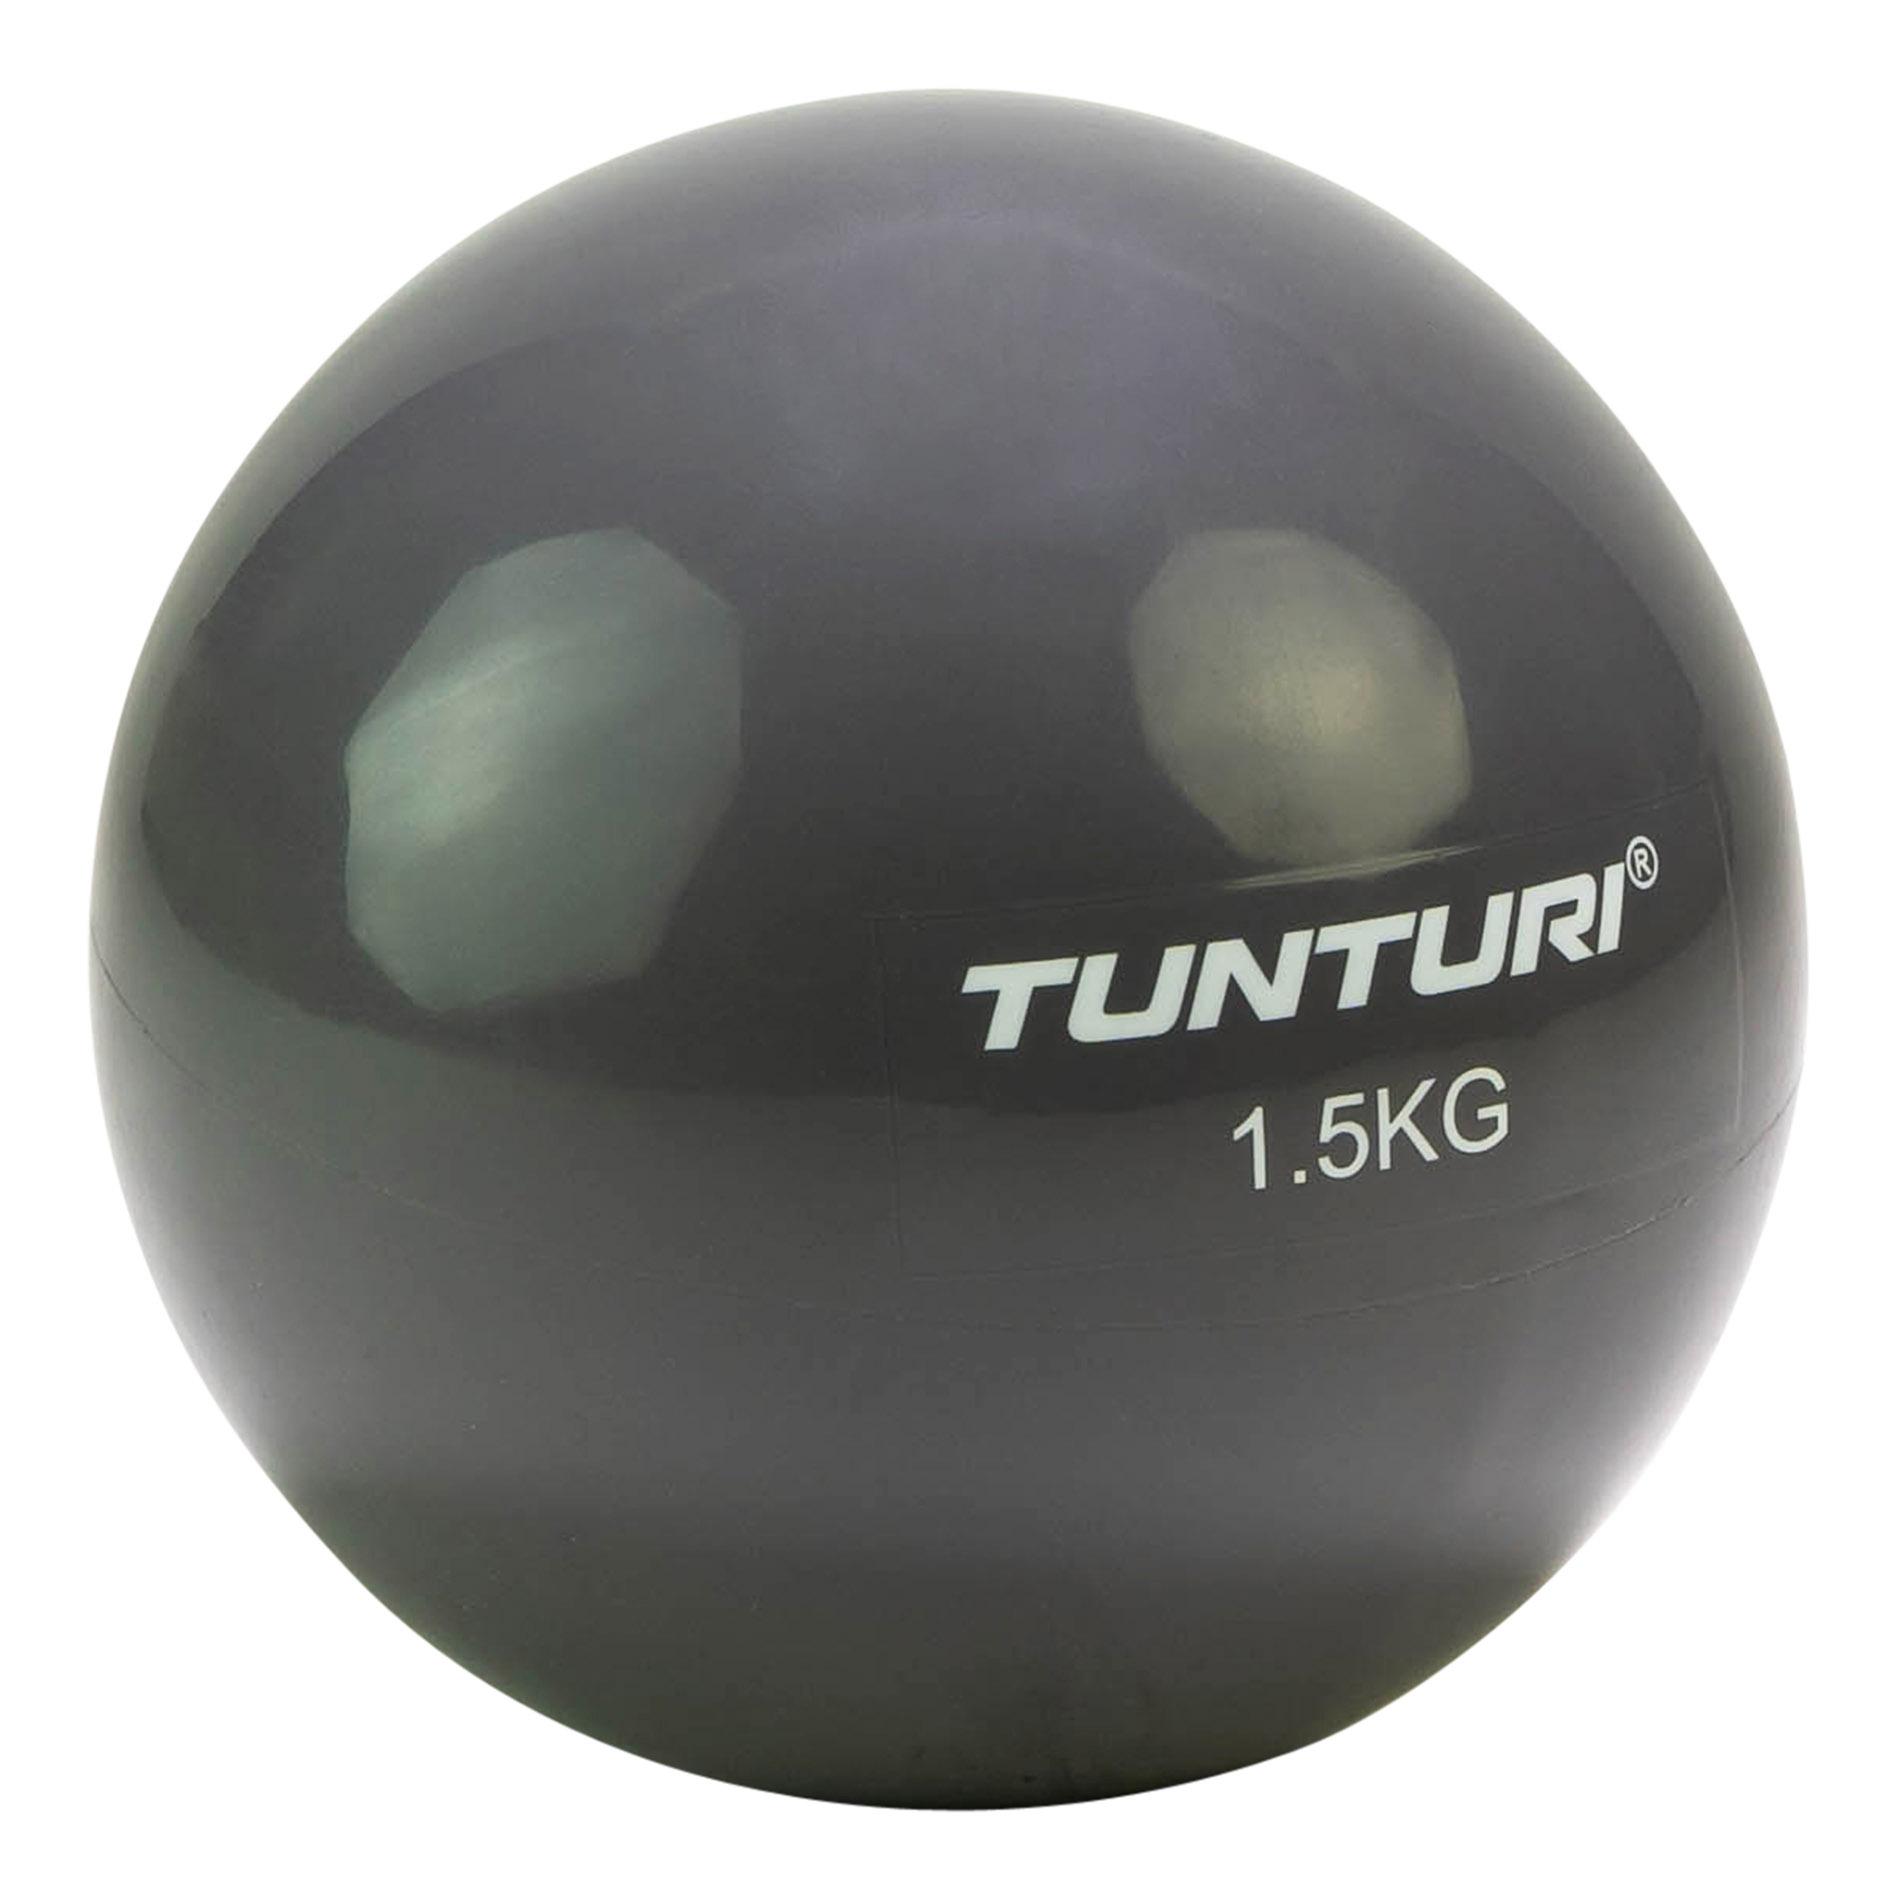 Joga míč Toningbal 1,5 kg TUNTURI antracitový